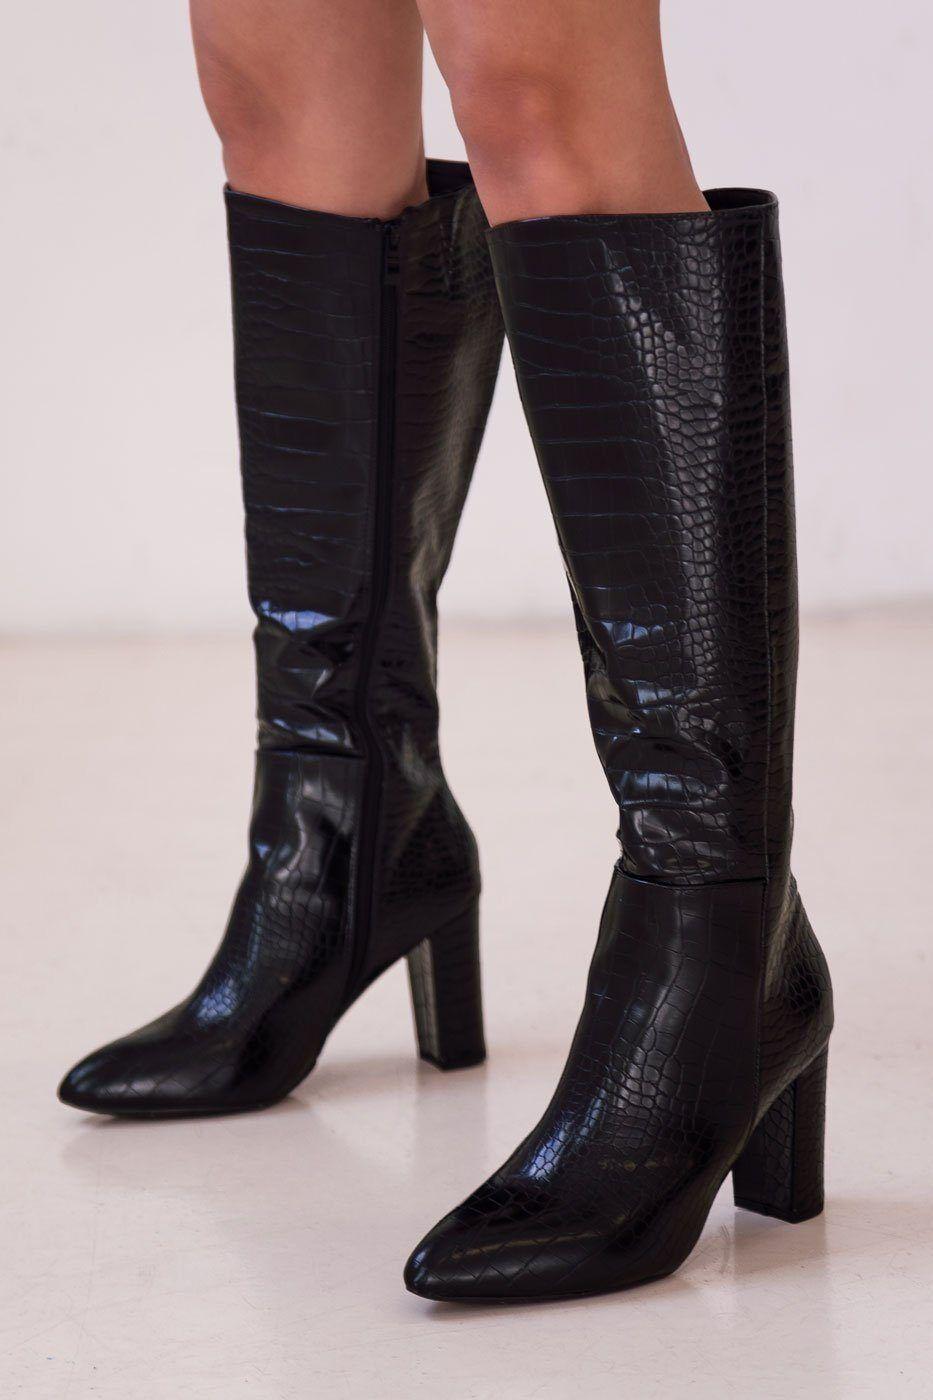 TOP MODA Talk Me Up Black Vegan Croc Boots  - J1006 BLACK 10